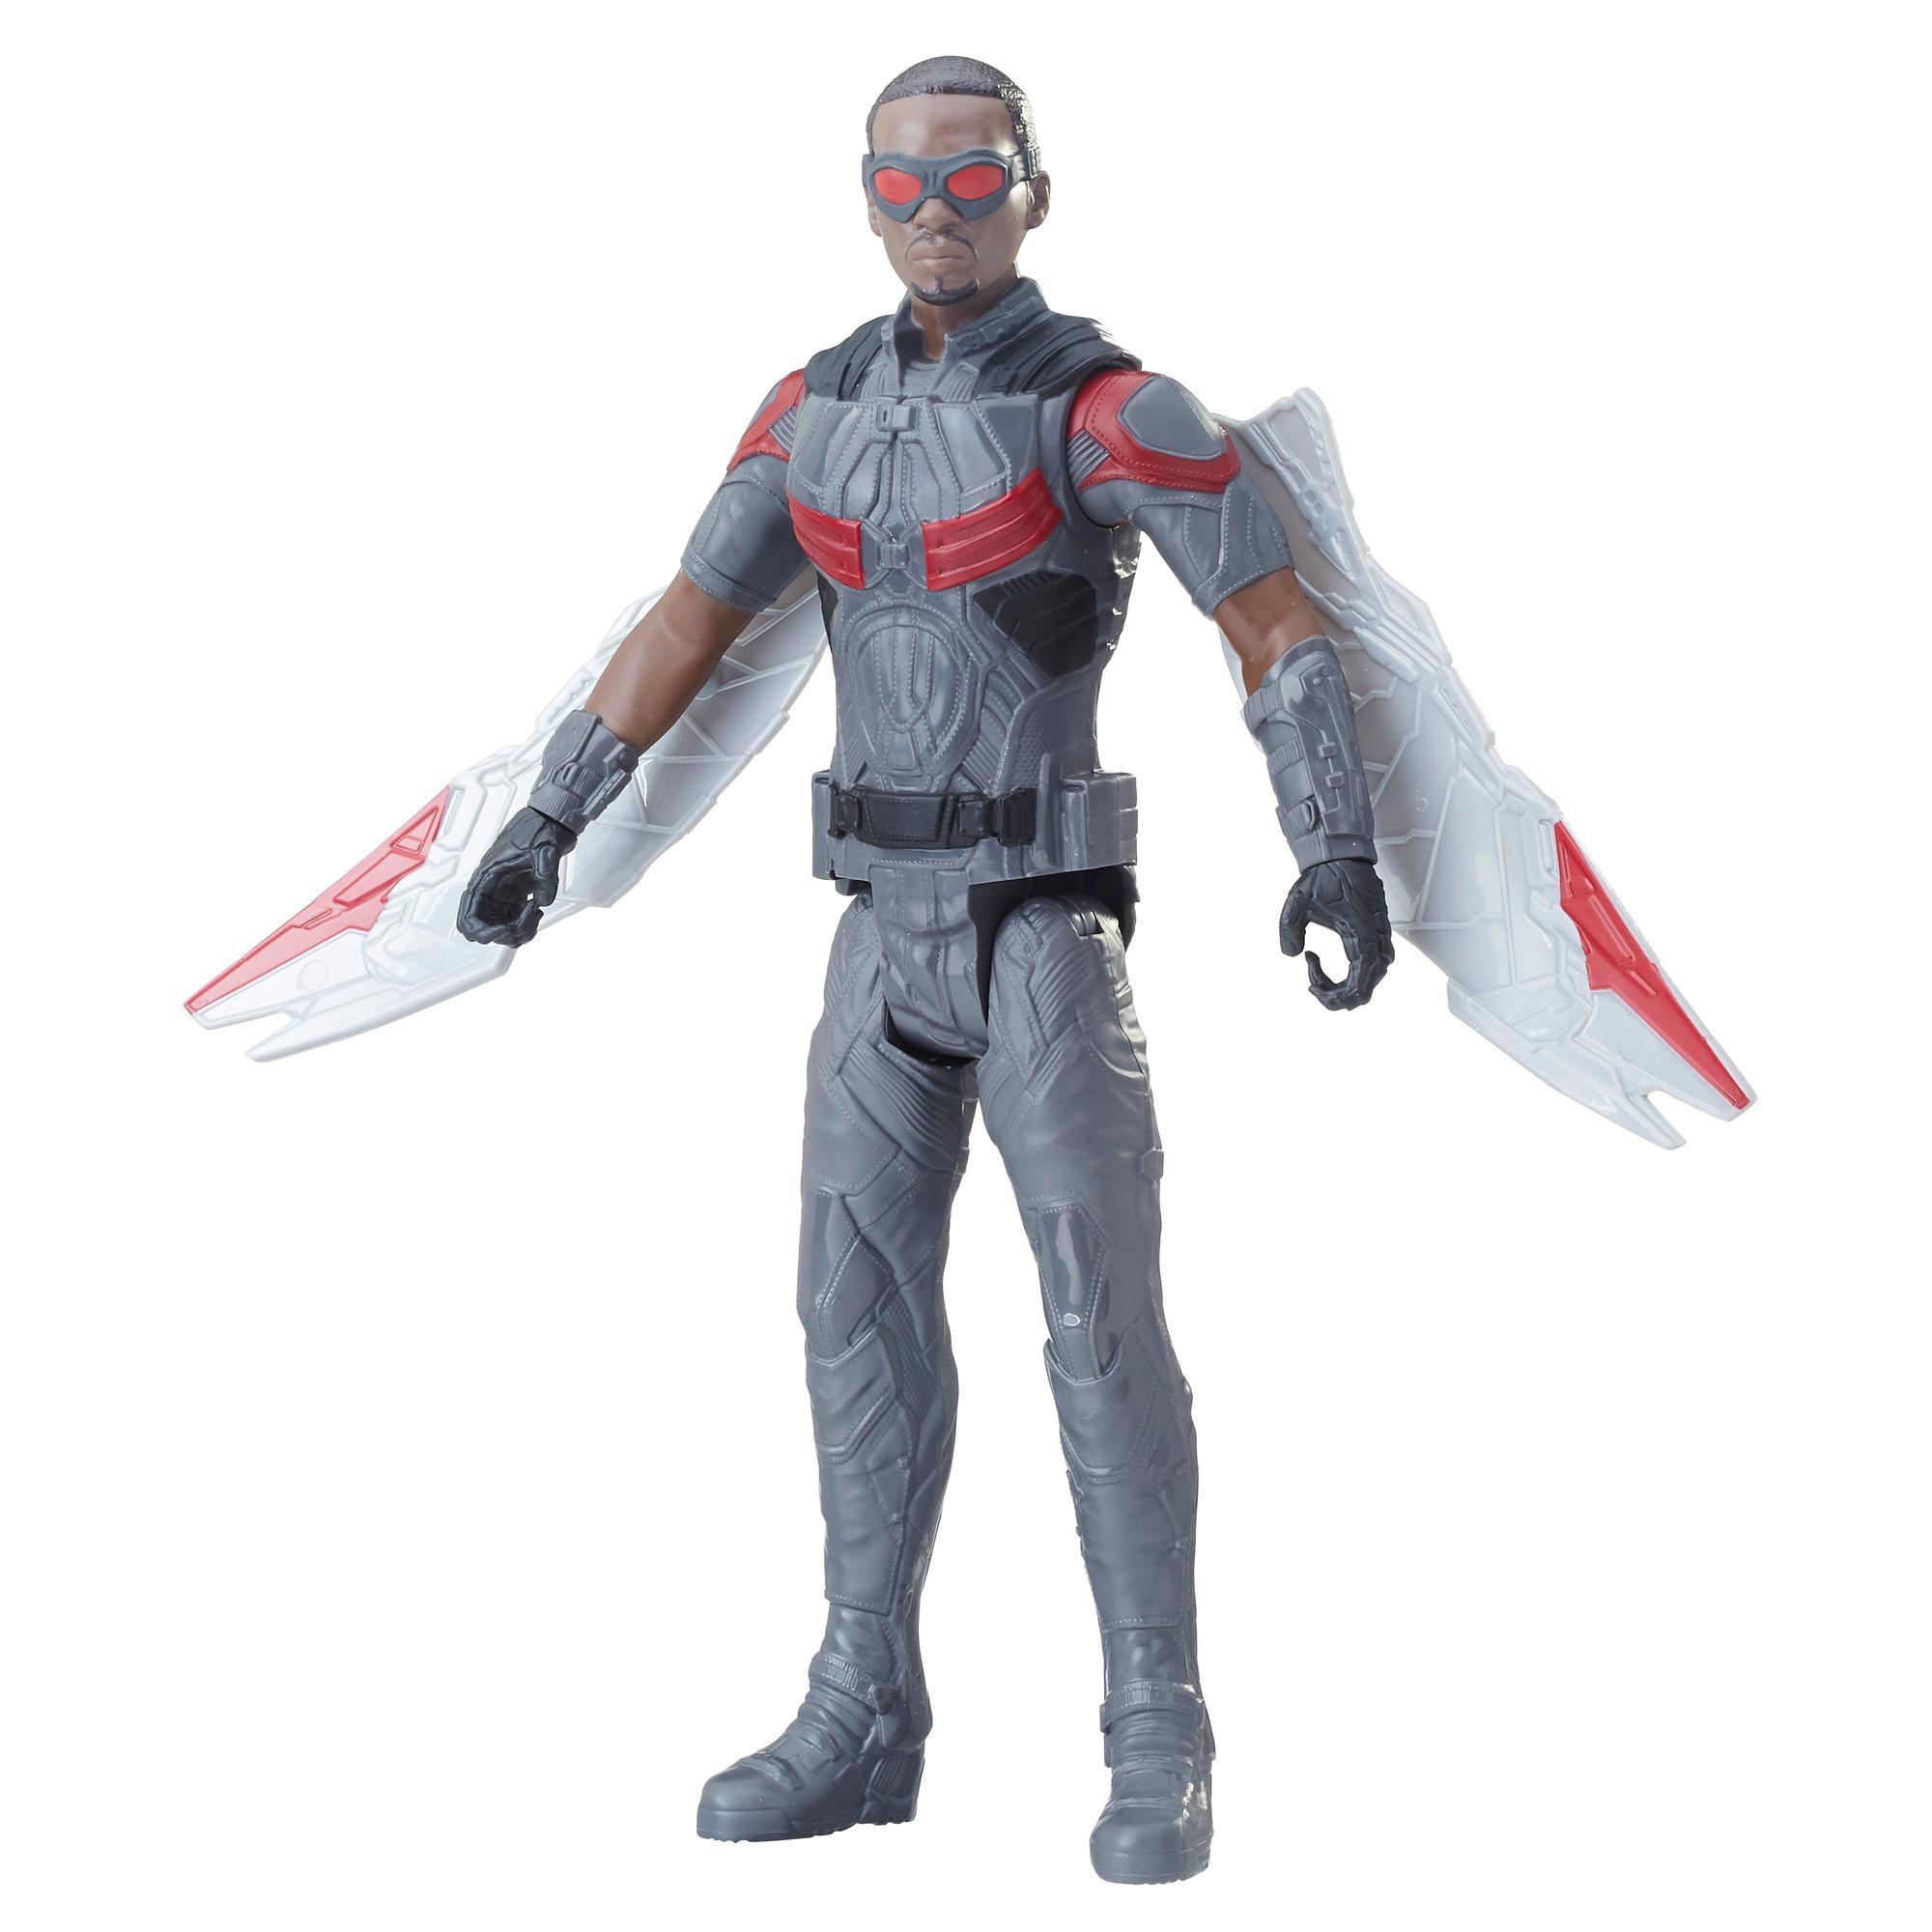 Marvel Infinity War Titan Hero Series - Marvel's Falcon con puerto para Titan Hero Power FX